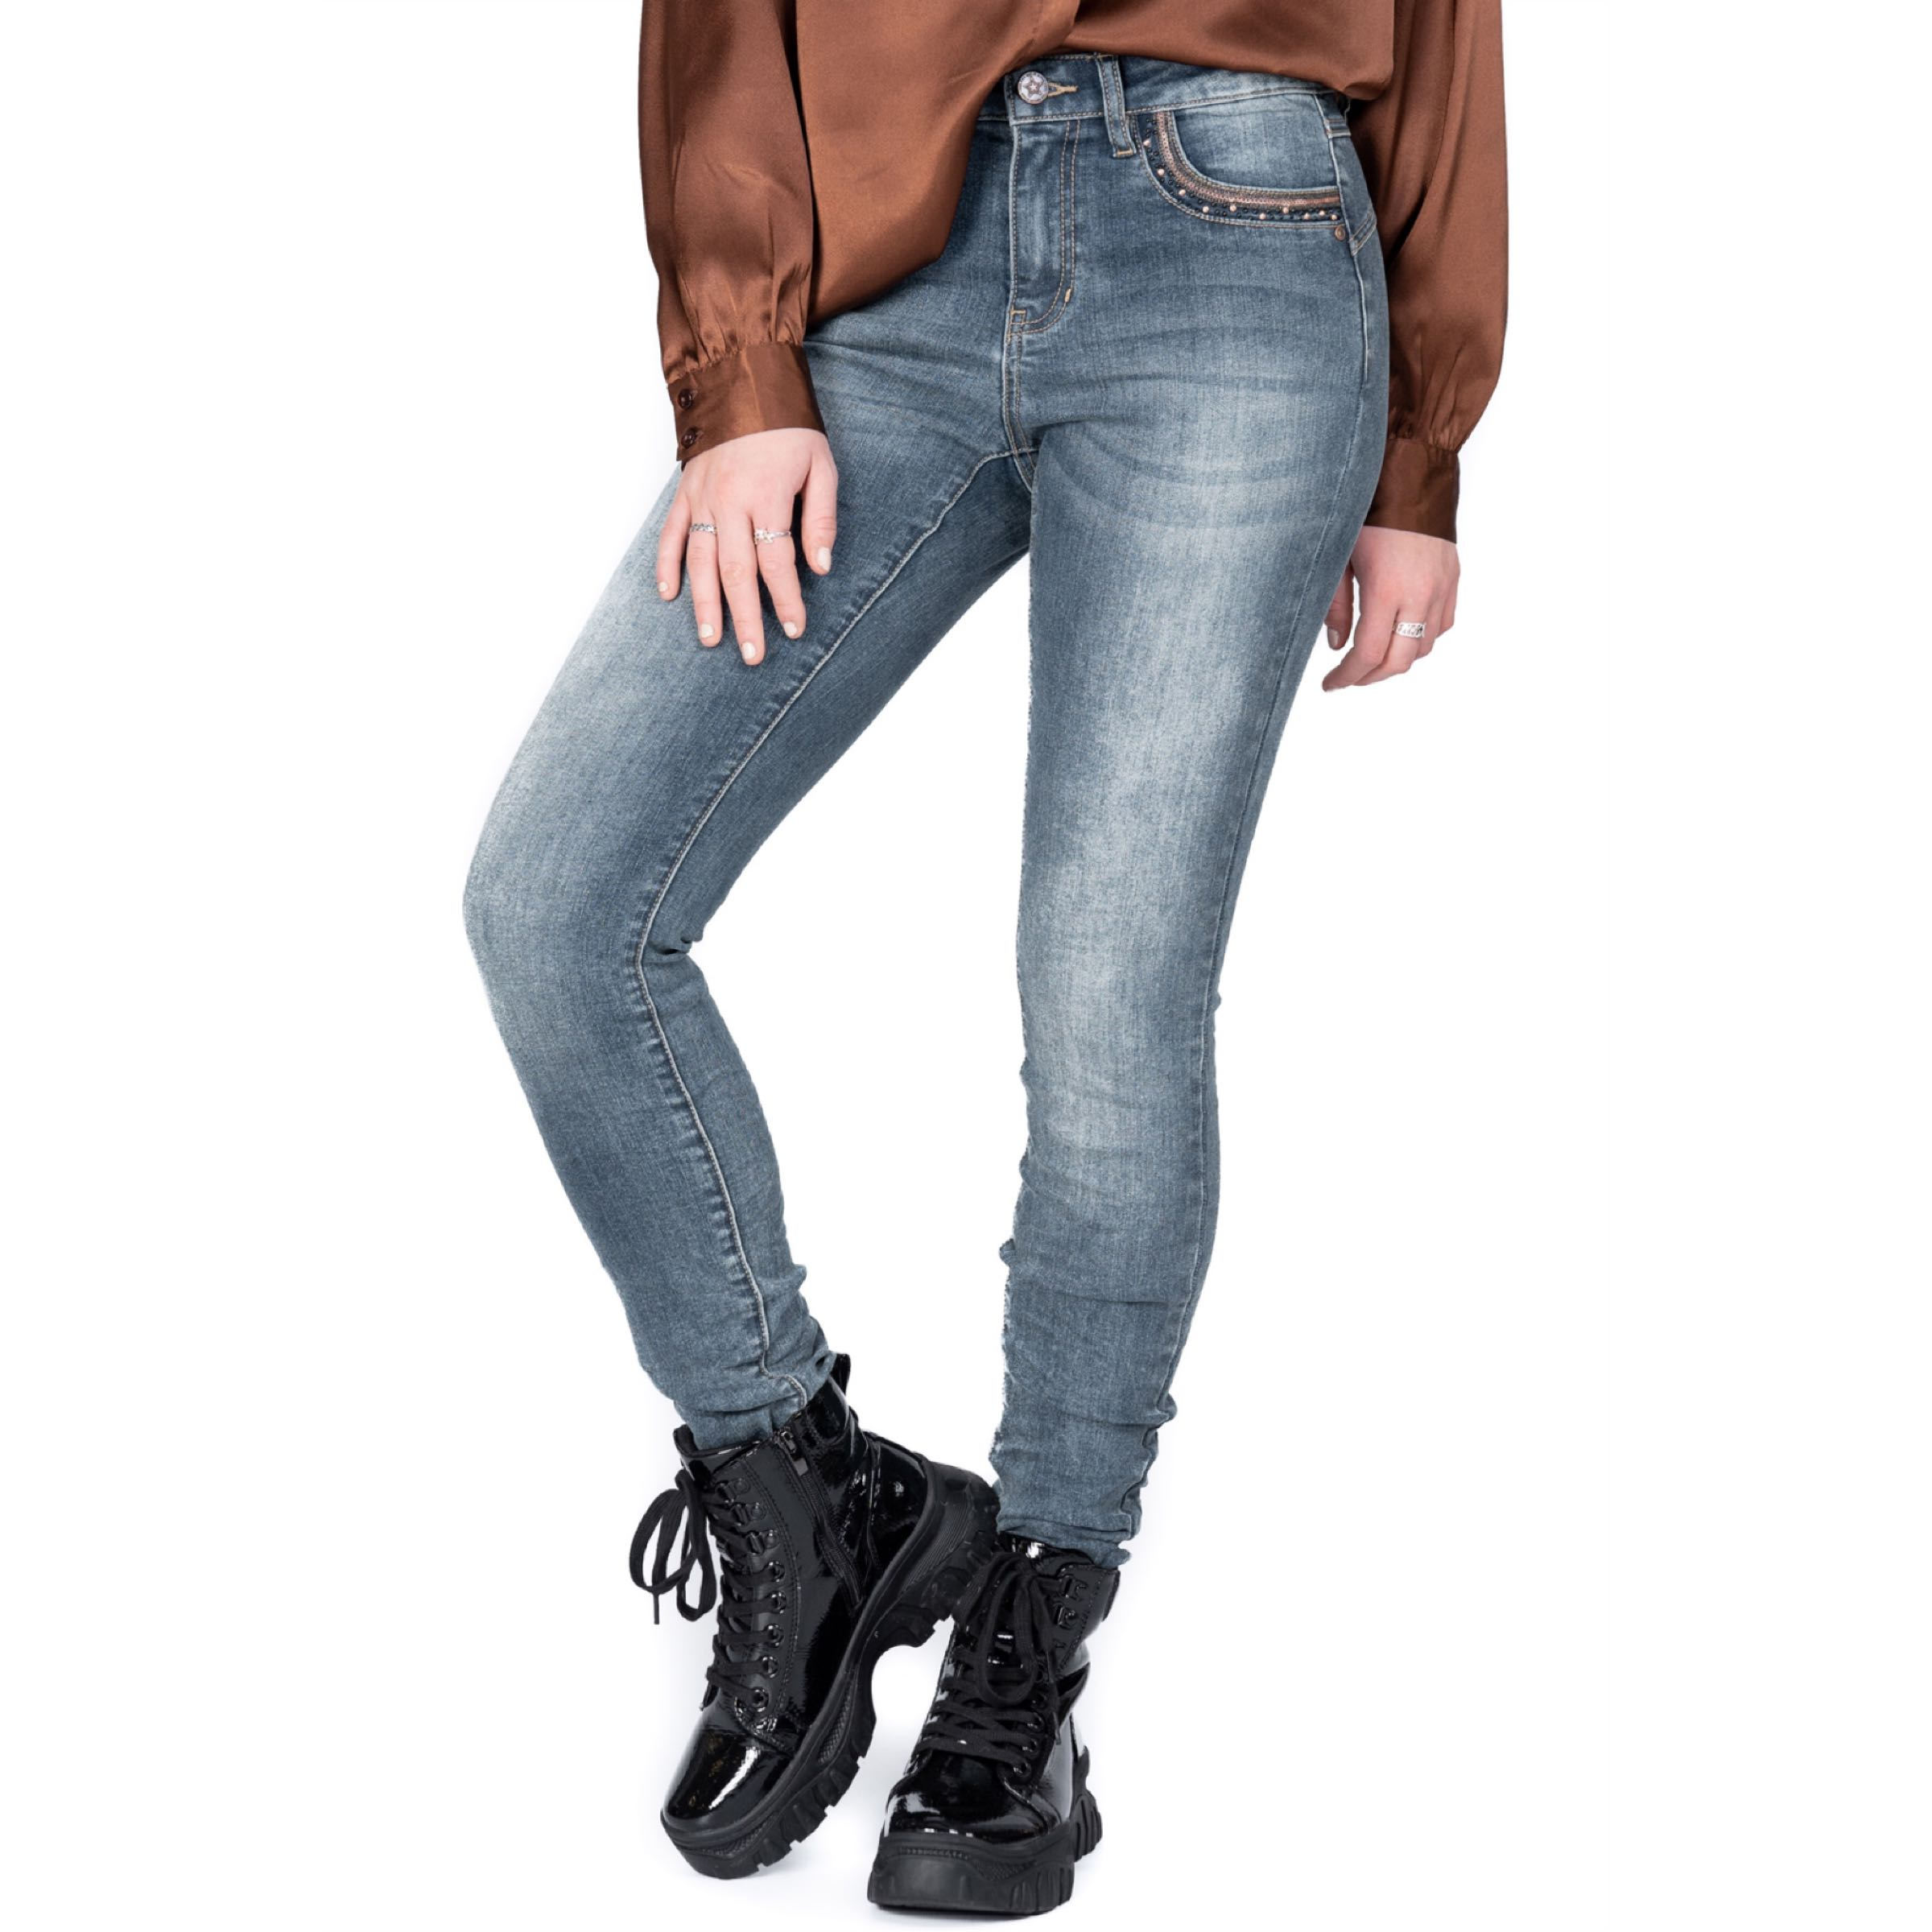 Stardust jeans